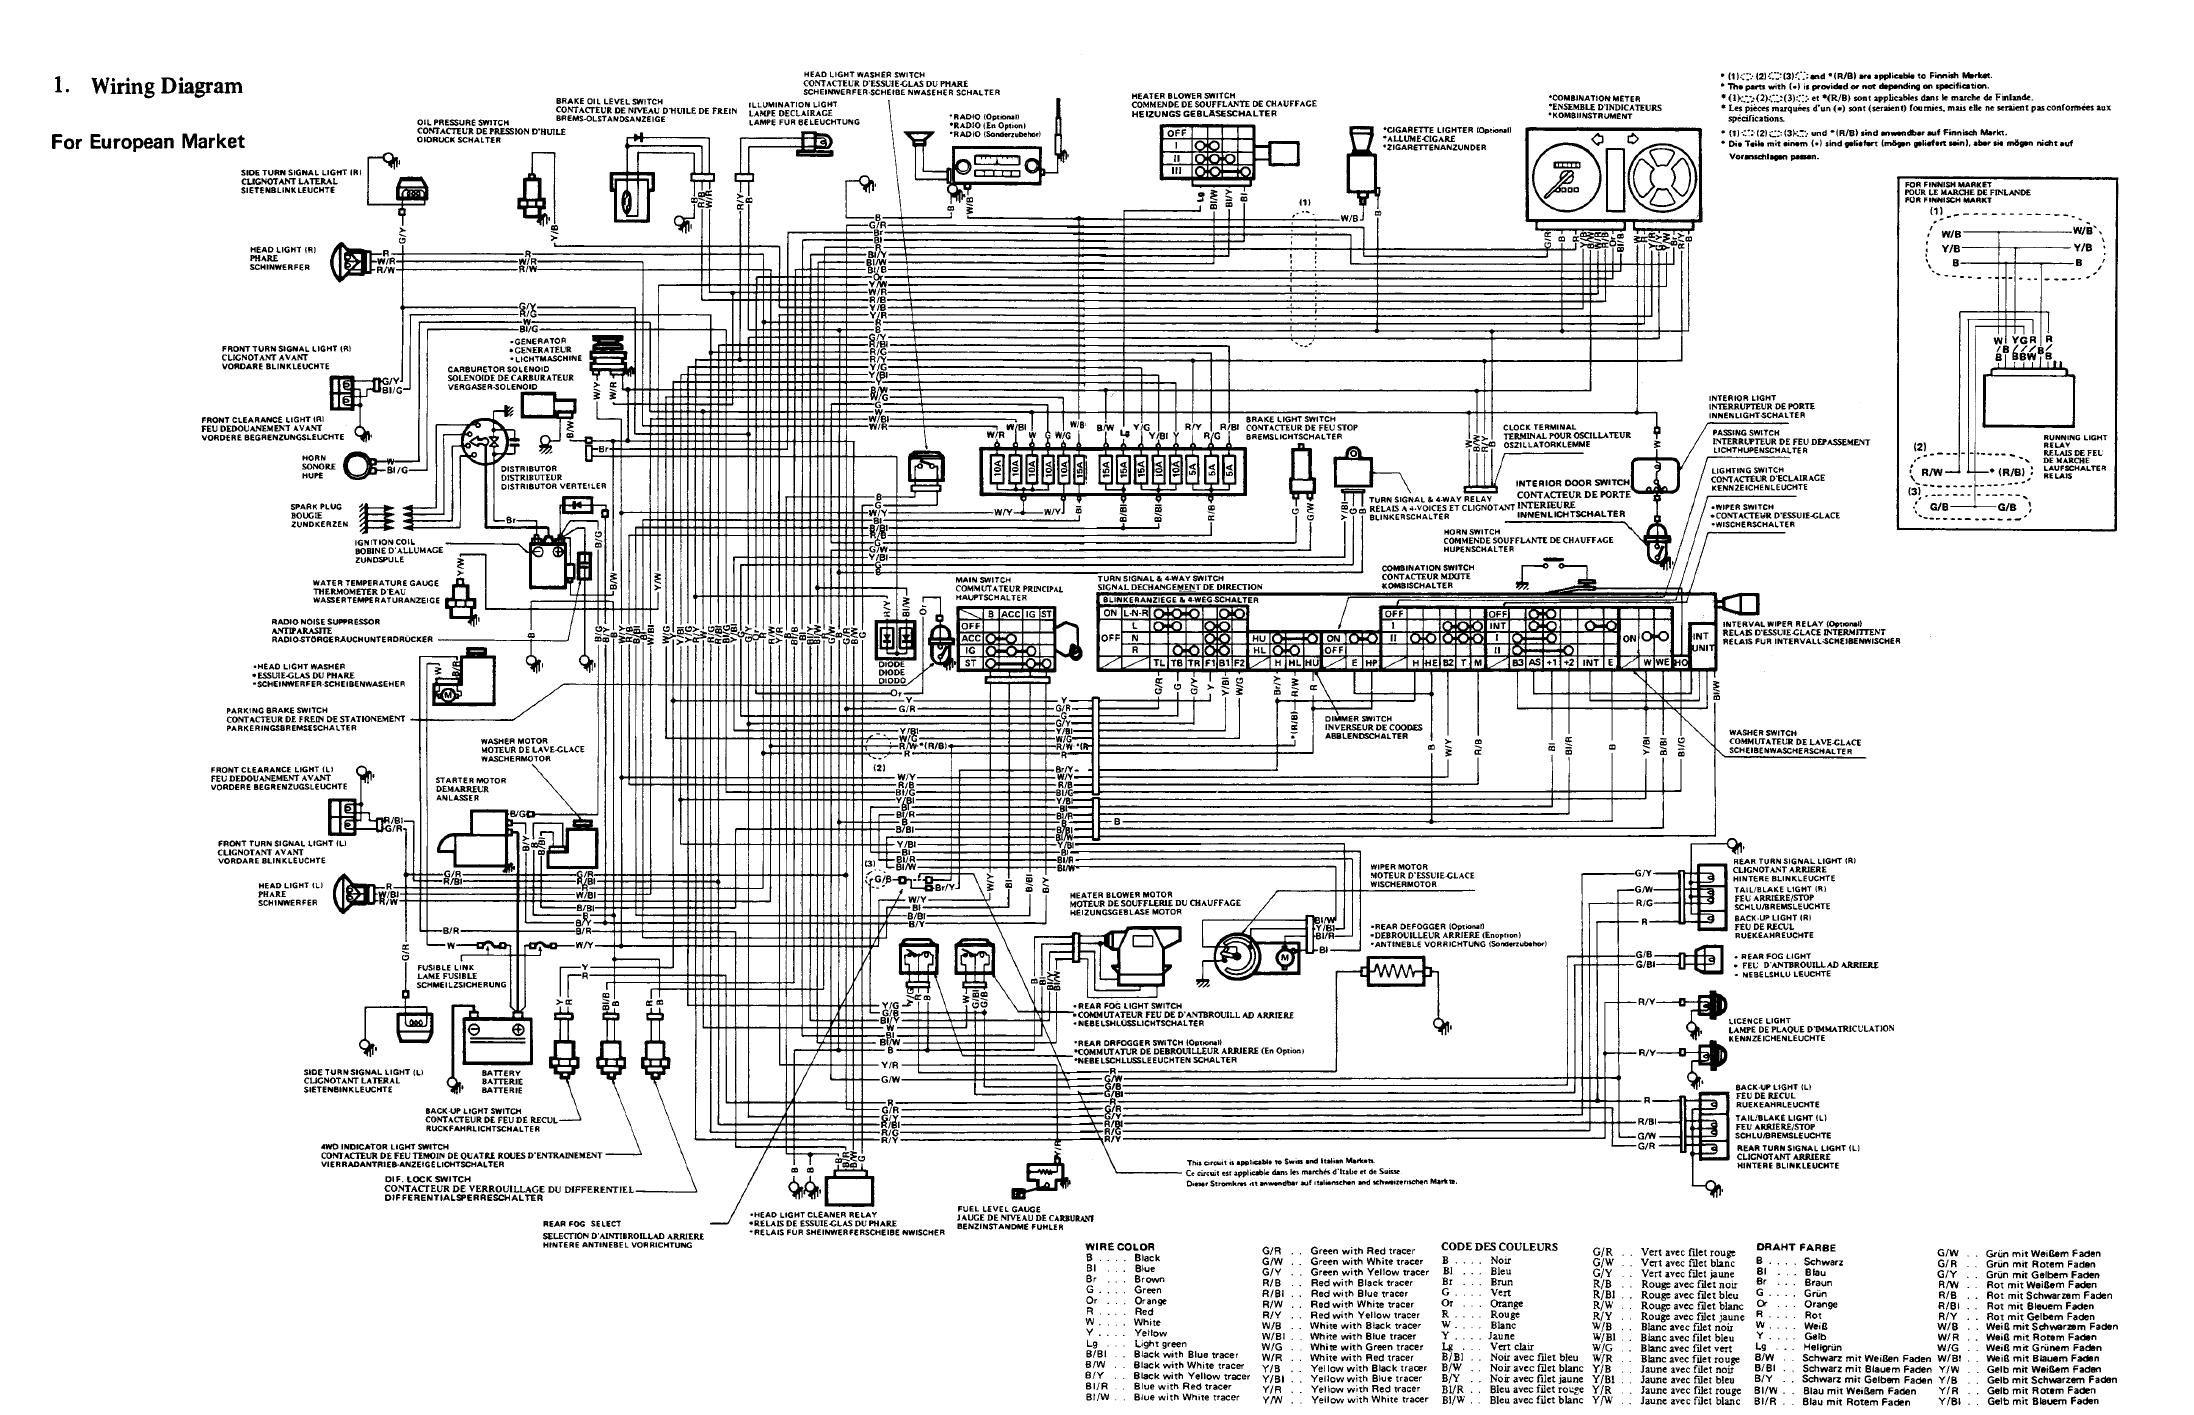 Wonderful Suzuki Jimny Wiring Diagram Gallery - Best Image Engine ...